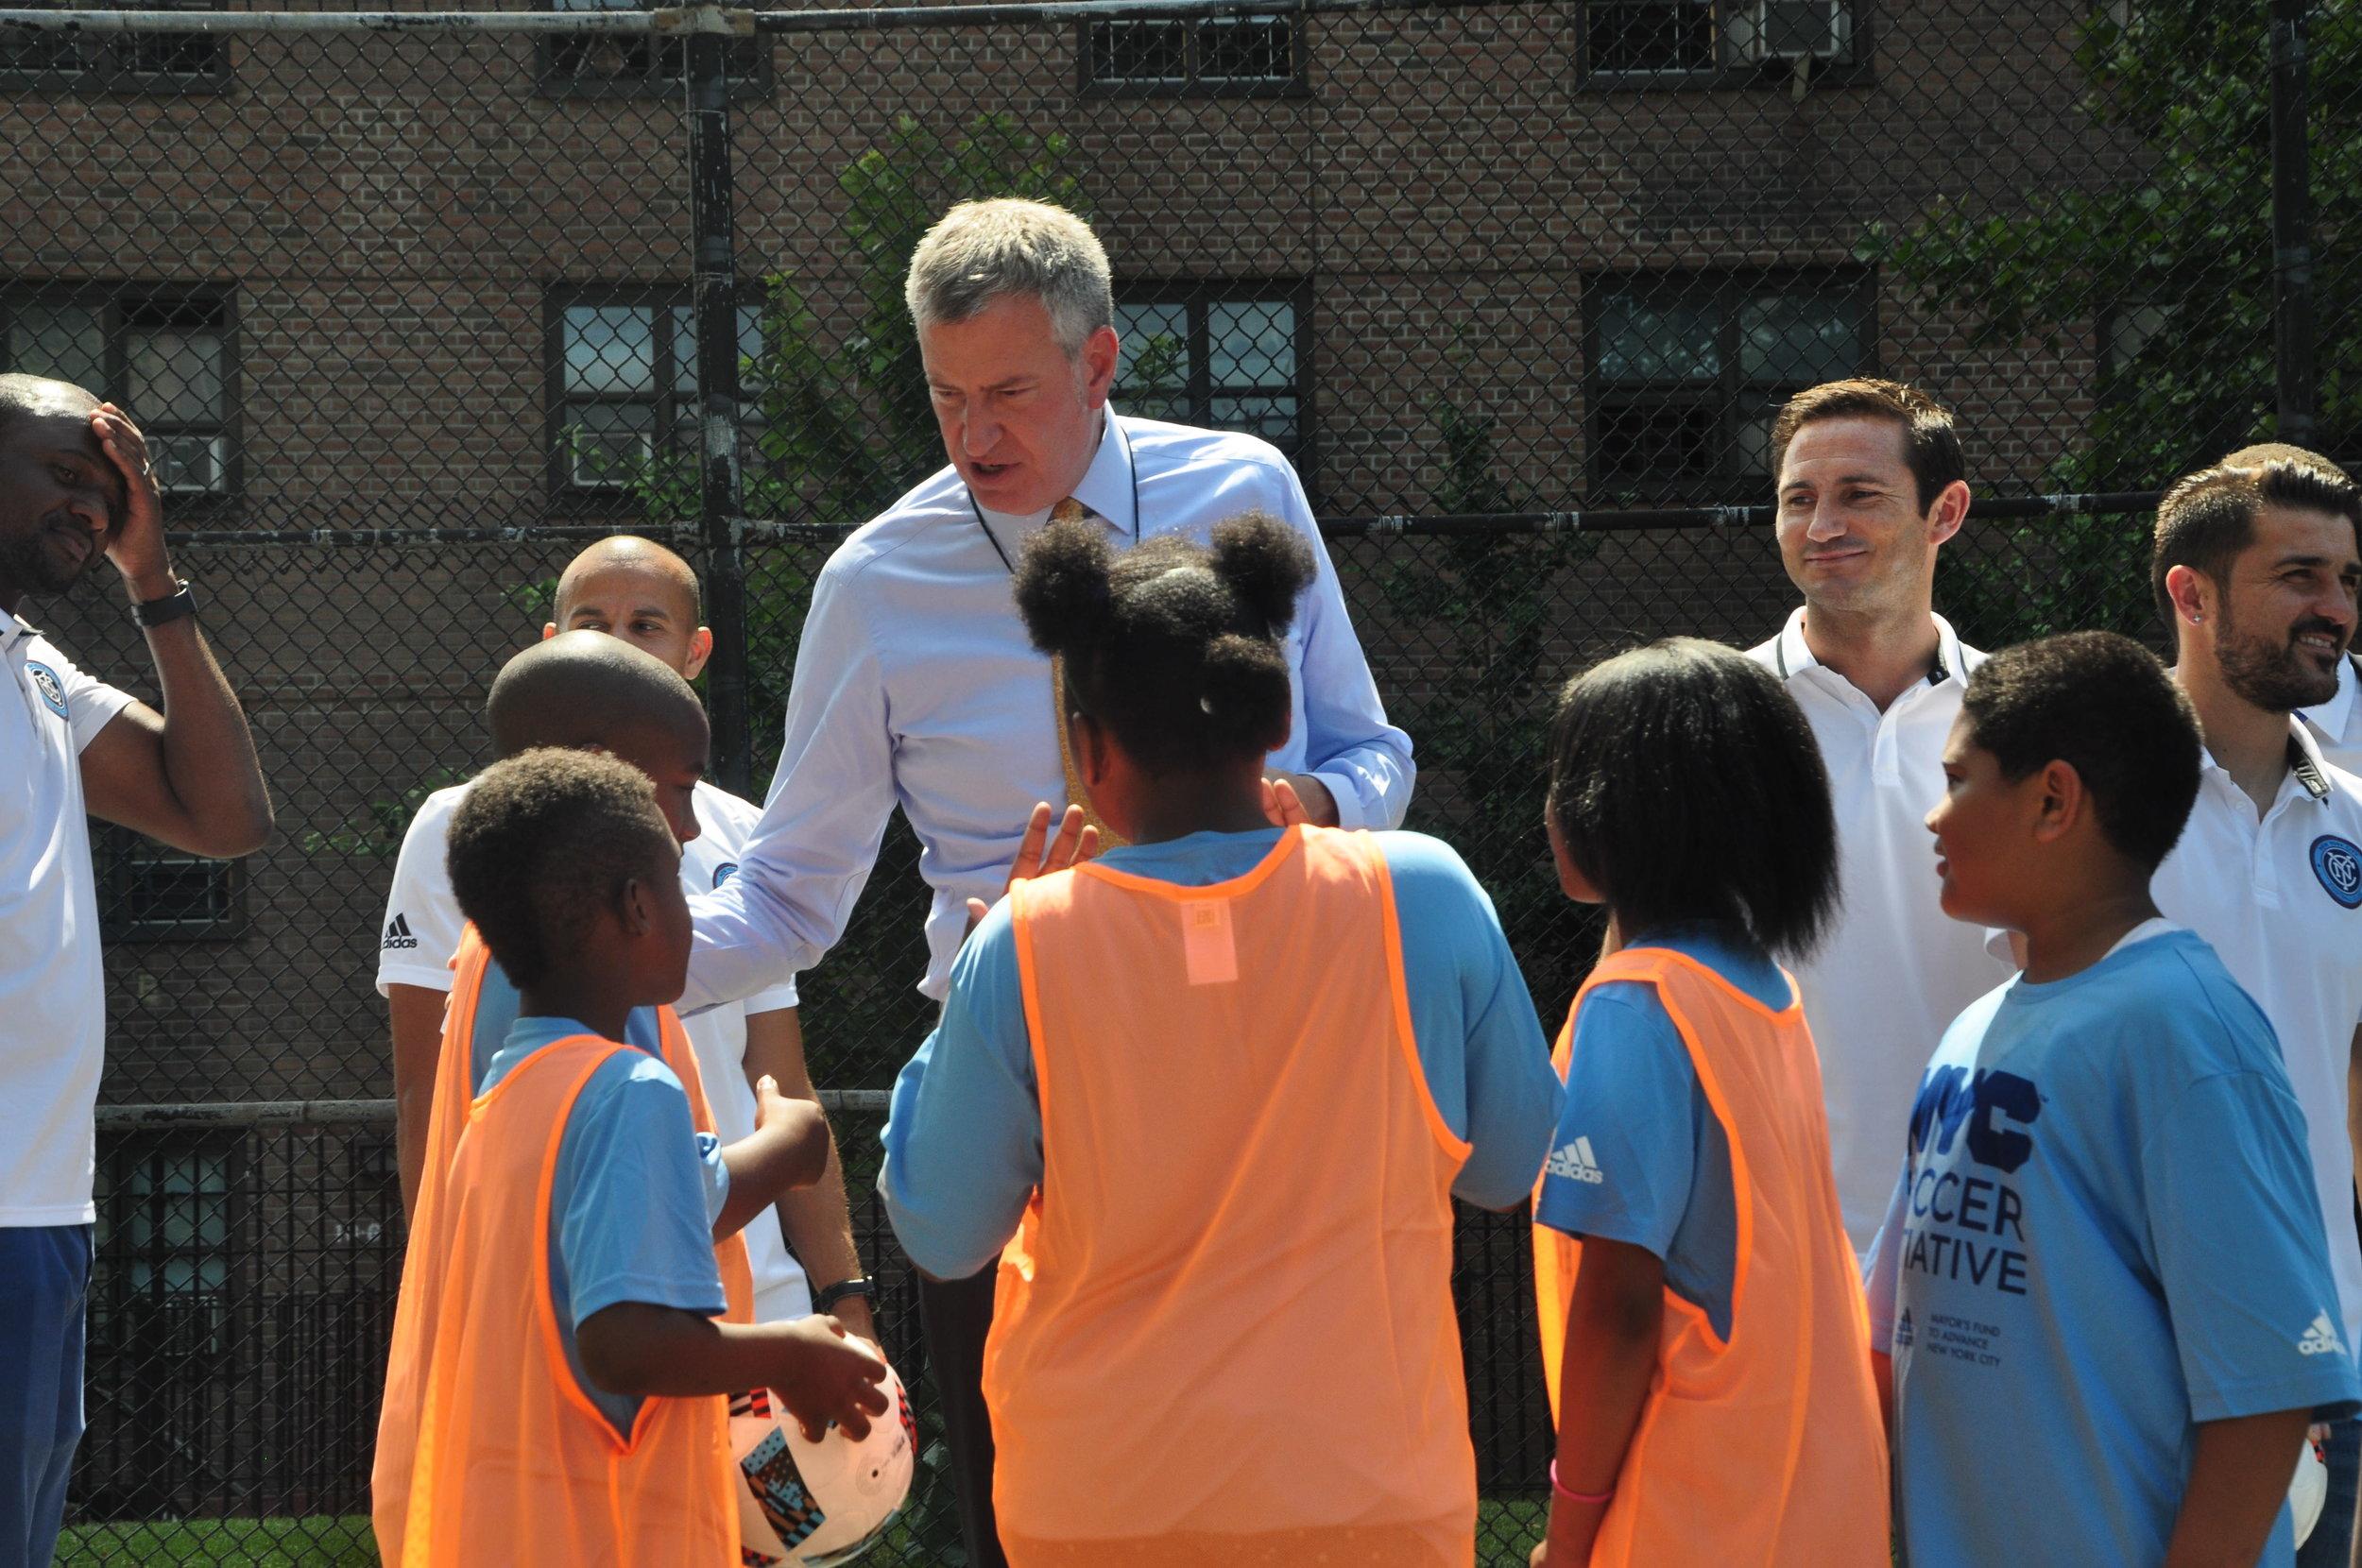 by Samali Bikangaga. Mayor de Blasio huddles with Bronx kids at Mill Brook Houses on July 11.